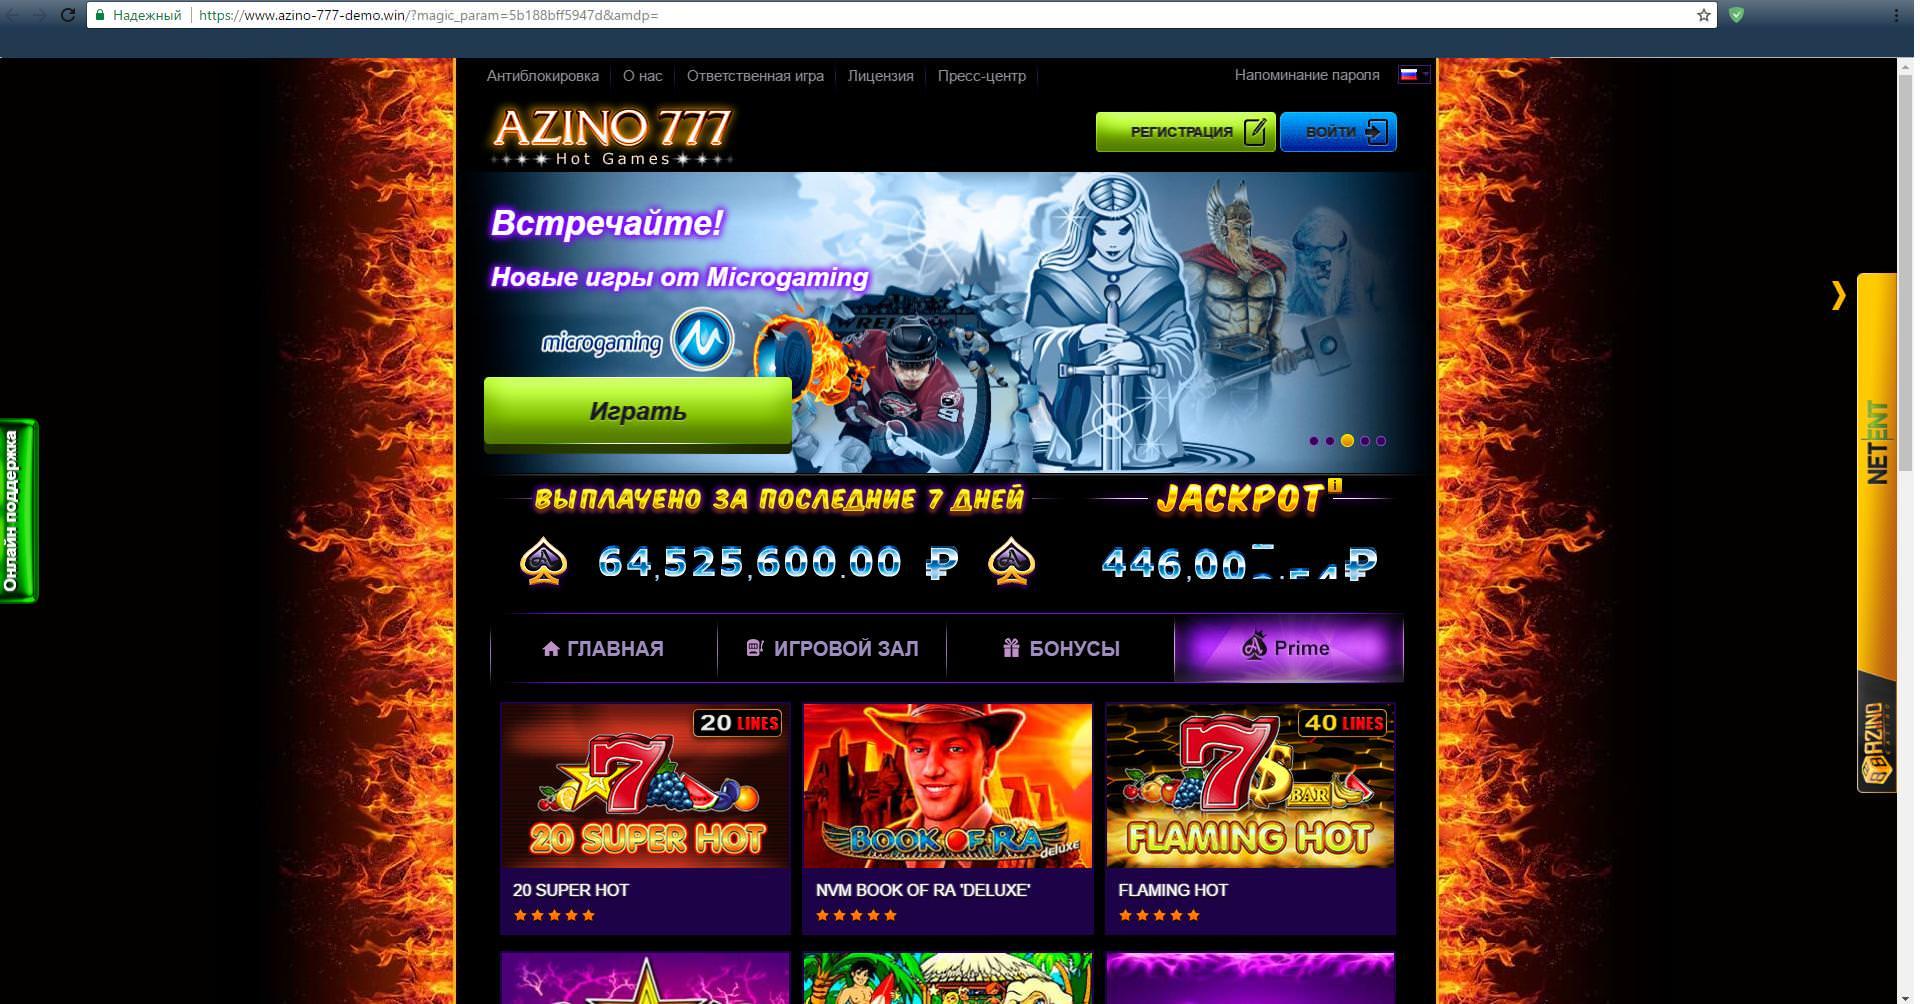 Характеристики казино Azino777